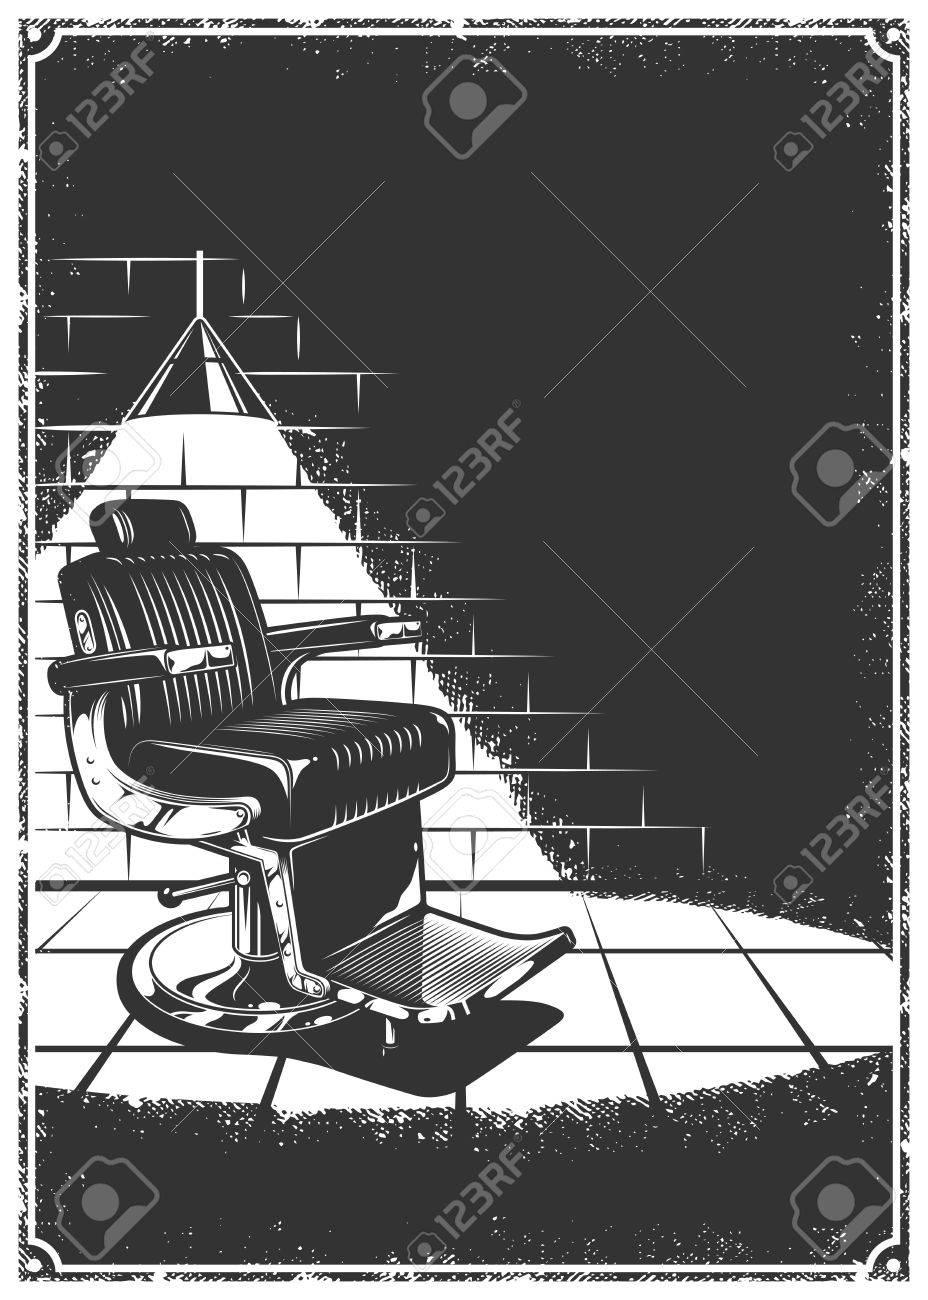 Vintage Barbershop Background With Barber Chair Lamp Light